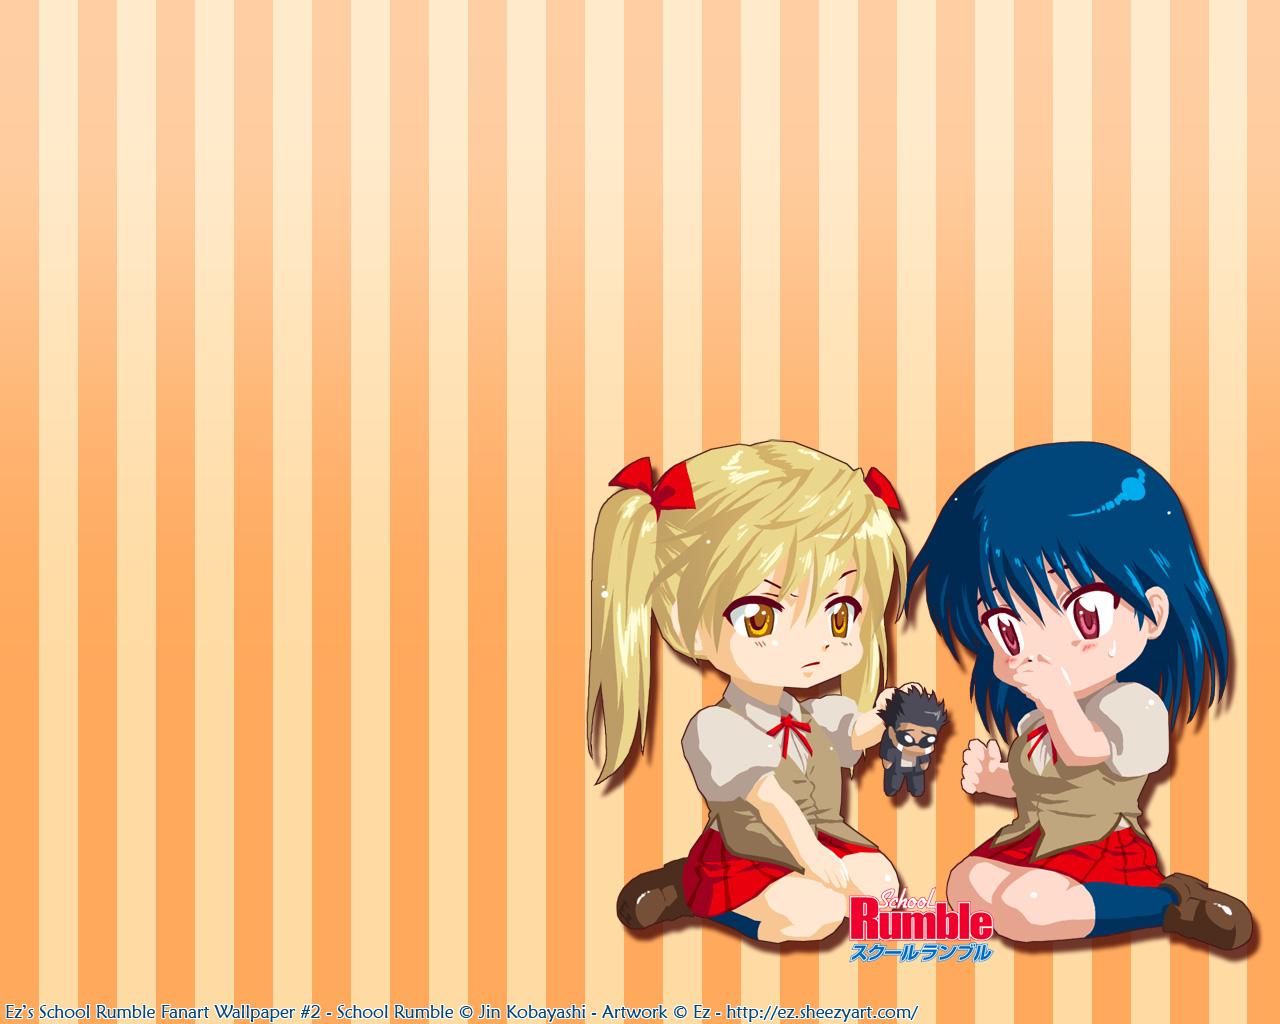 School Rumble 4th Semester Season 3 Release Date Otaku 1280x1024